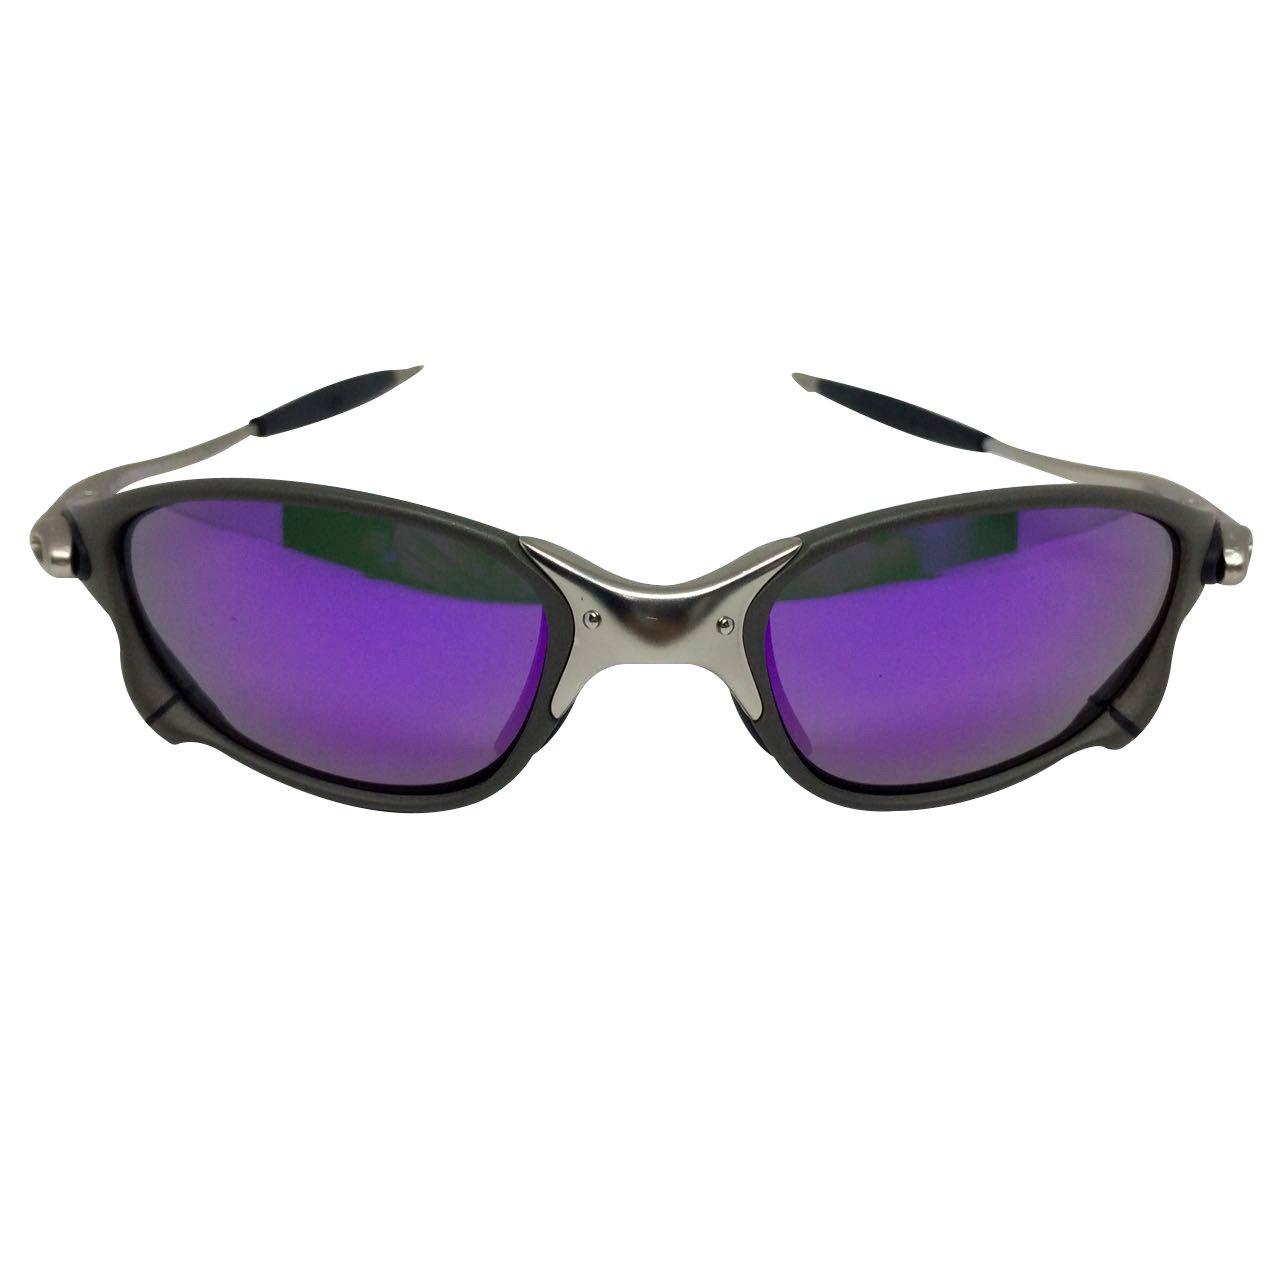 Óculos Oakley Juliet Doublexx Tio2 cromado lente roxa – Sanfer ... 342b6d4c2e